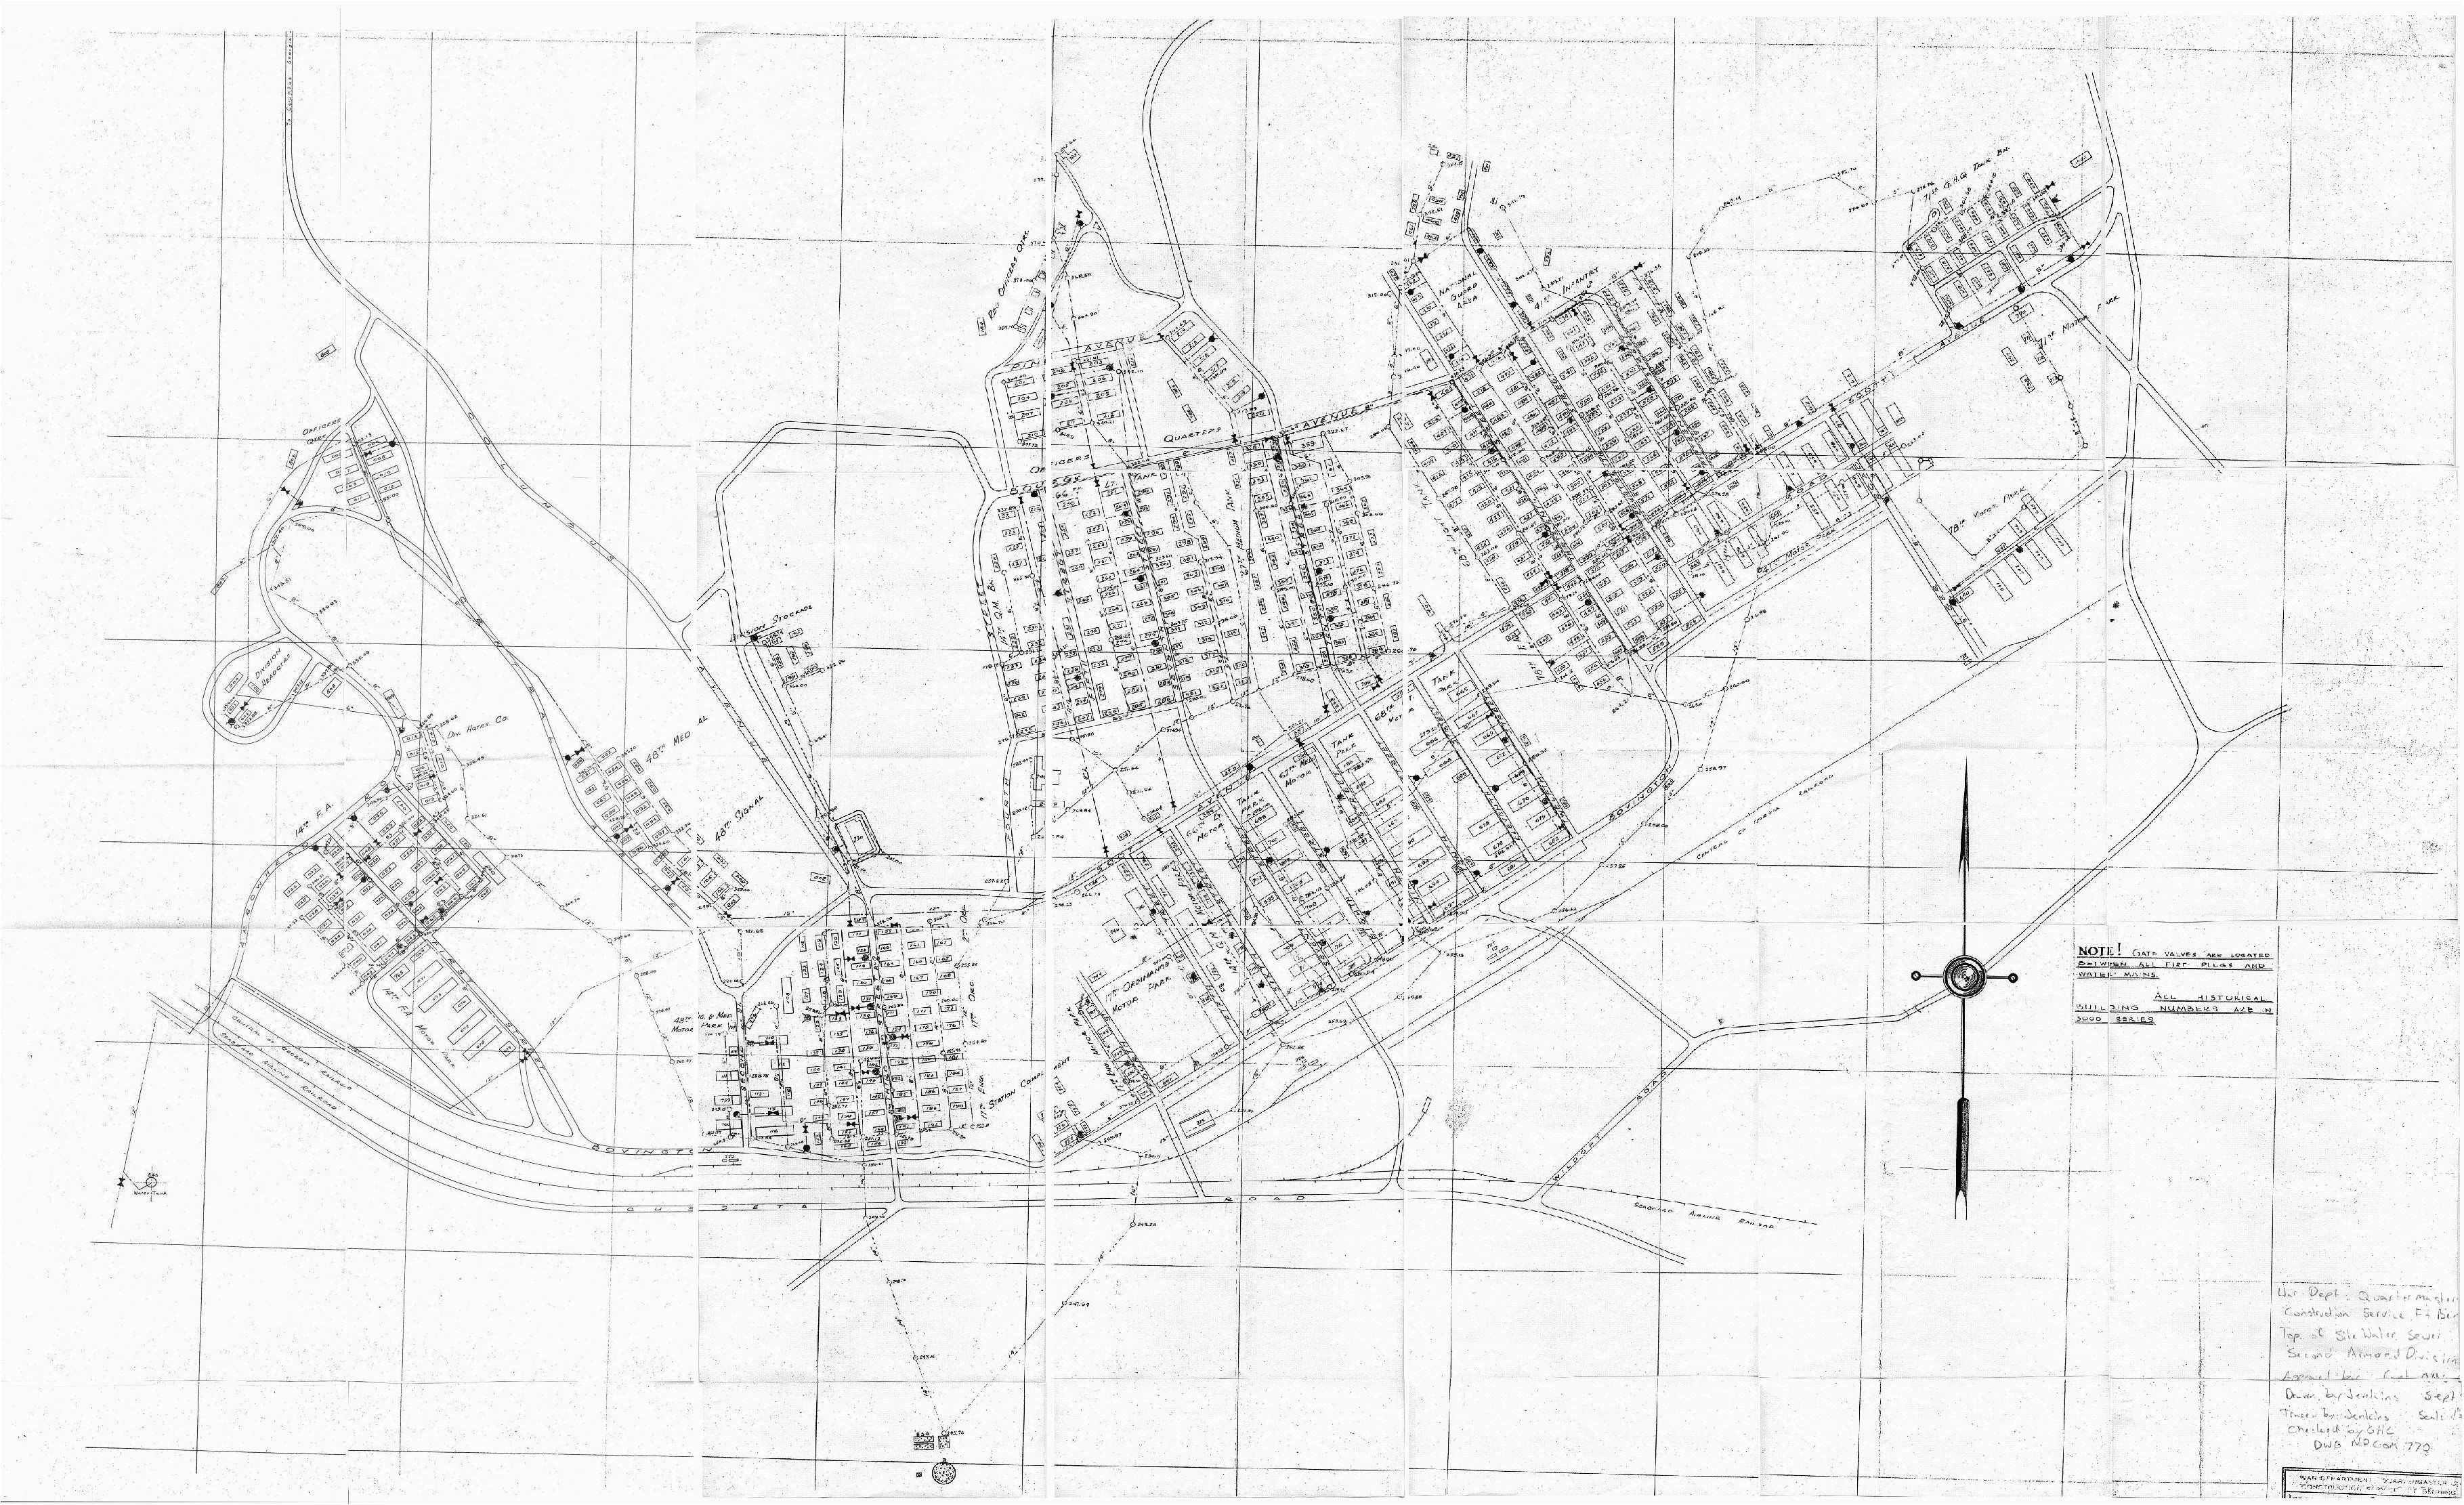 Map Of Georgia Fort Benning.Ft Benning Georgia Map Secretmuseum